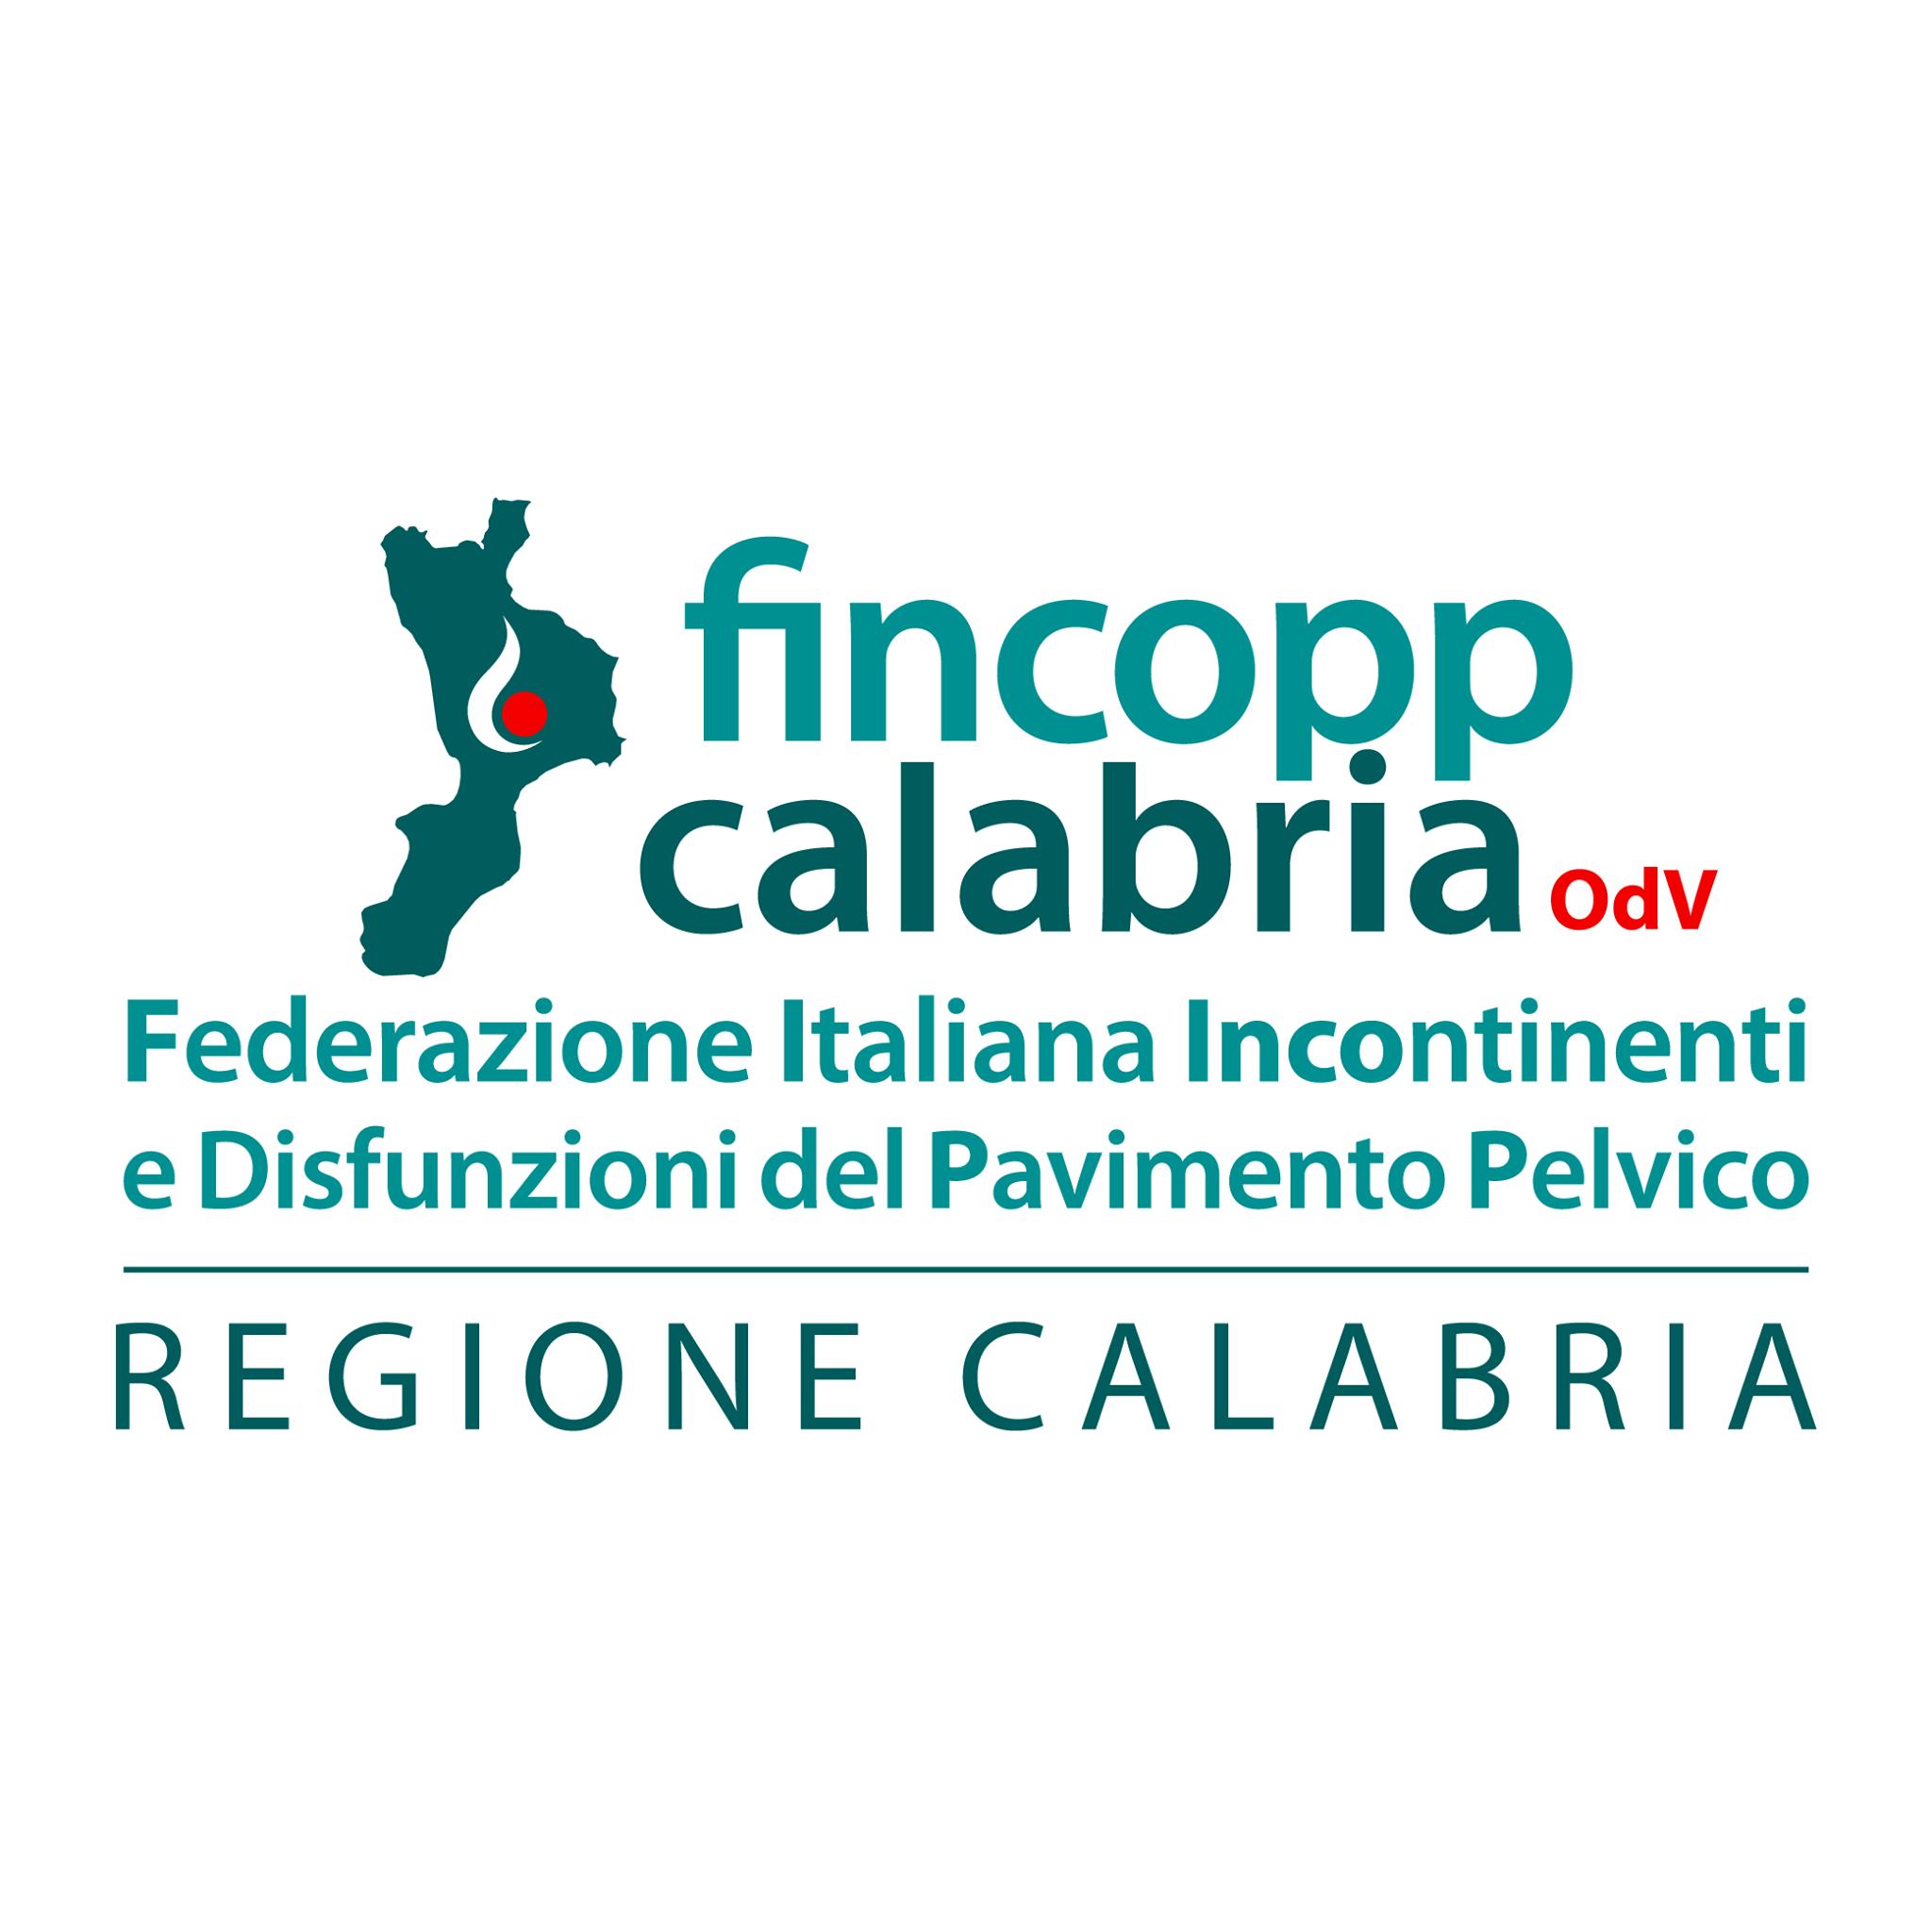 FINCOPP CALABRIA OdV